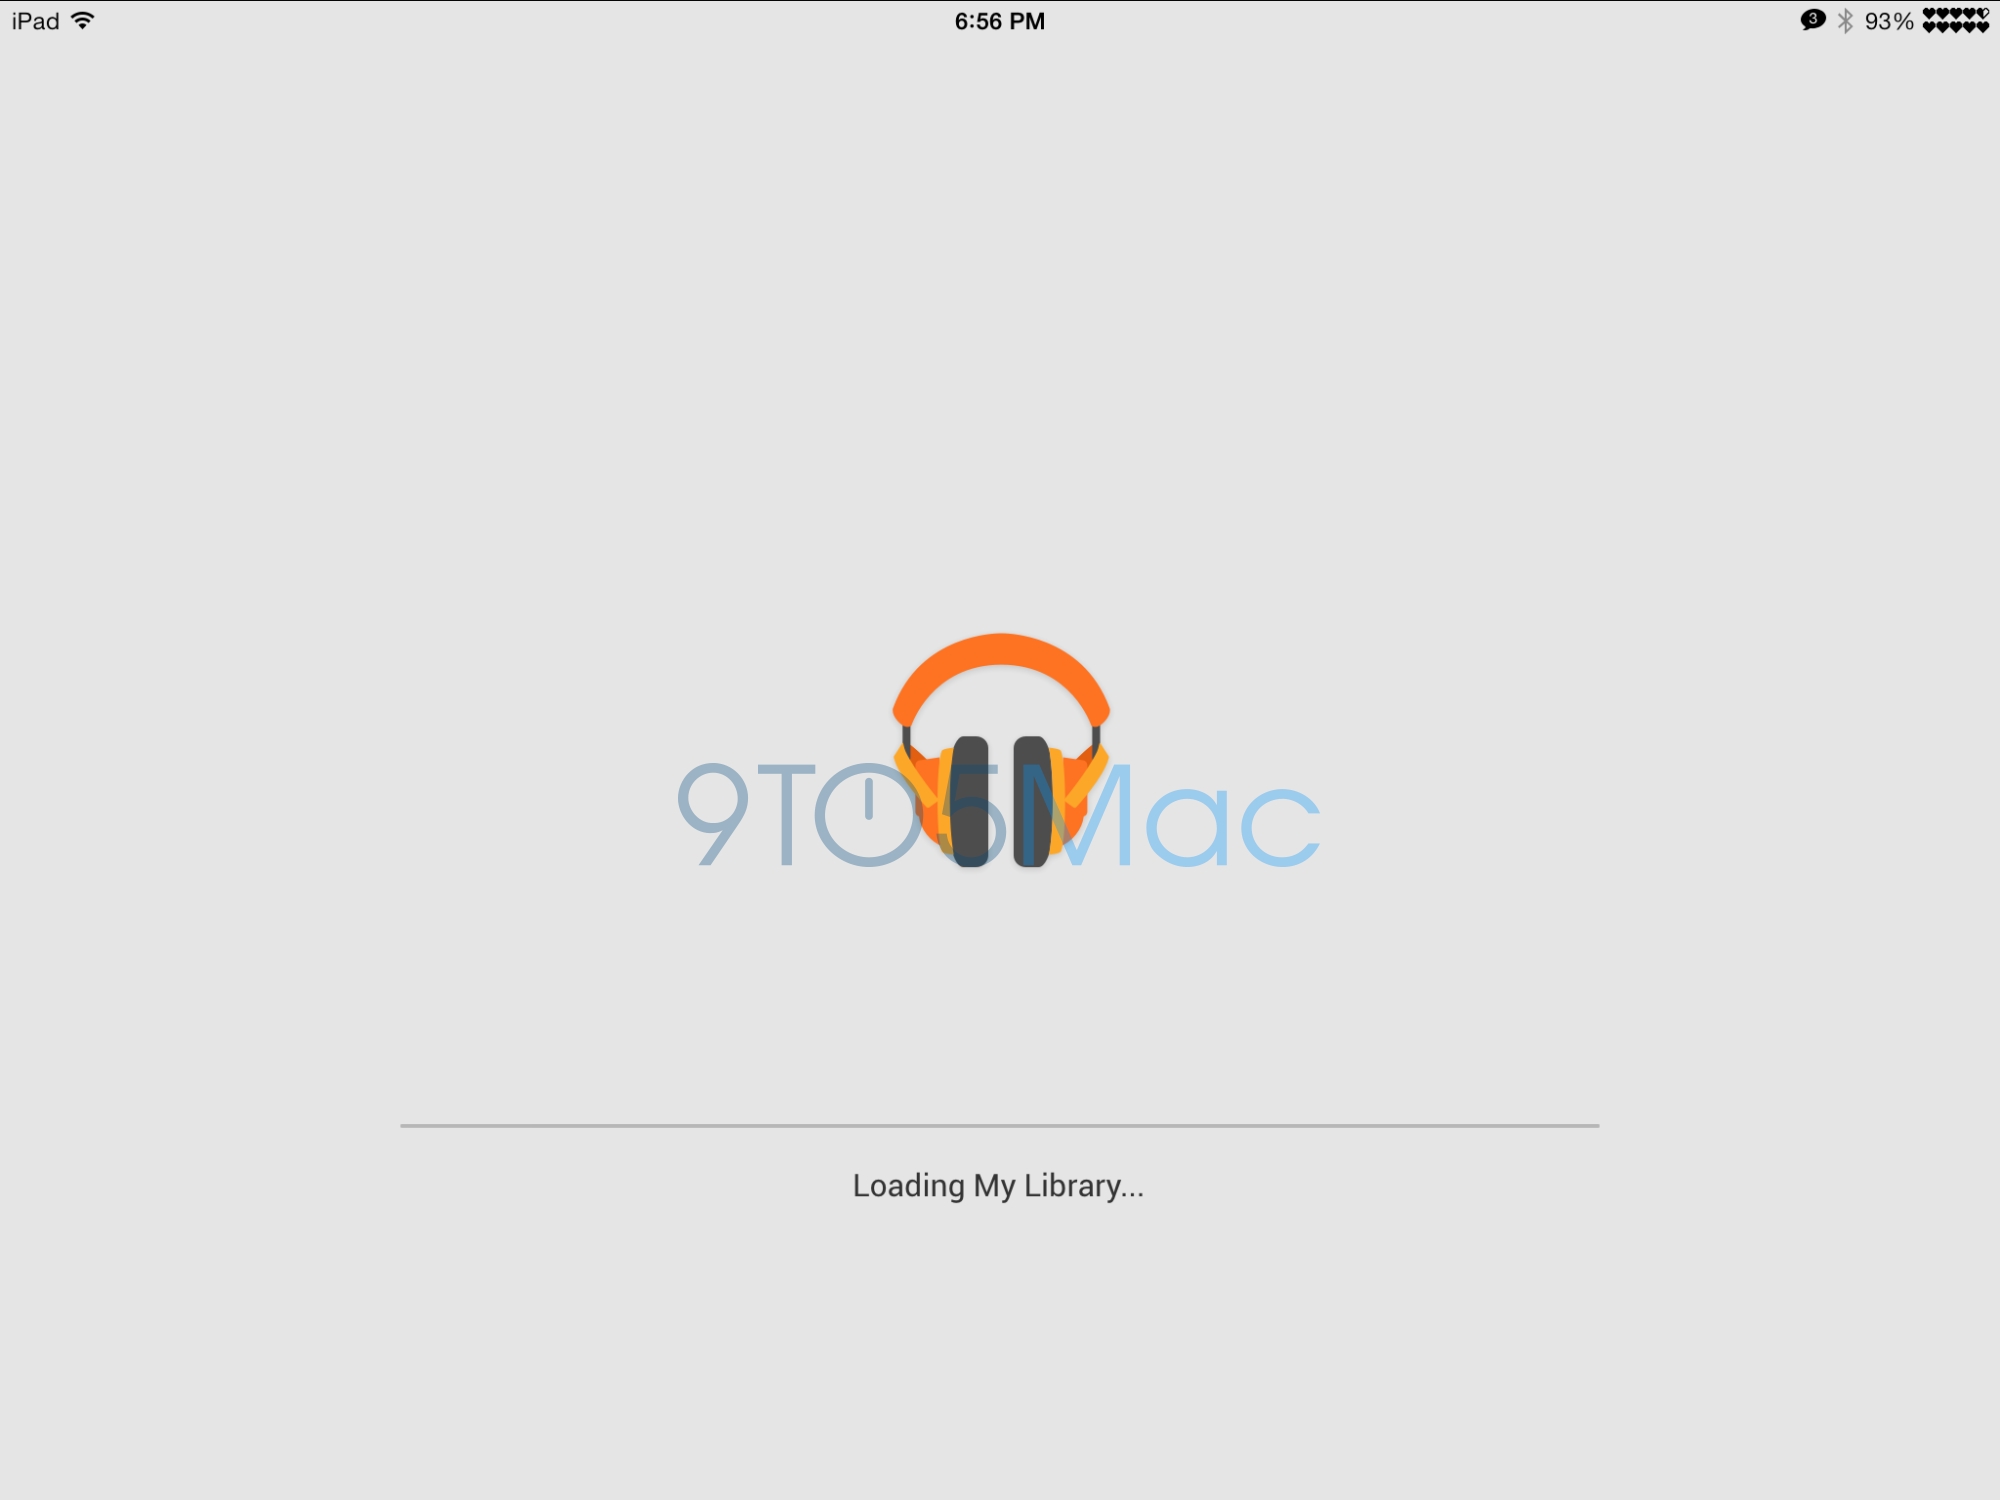 Google Play Music iPad app hidden inside iPhone version